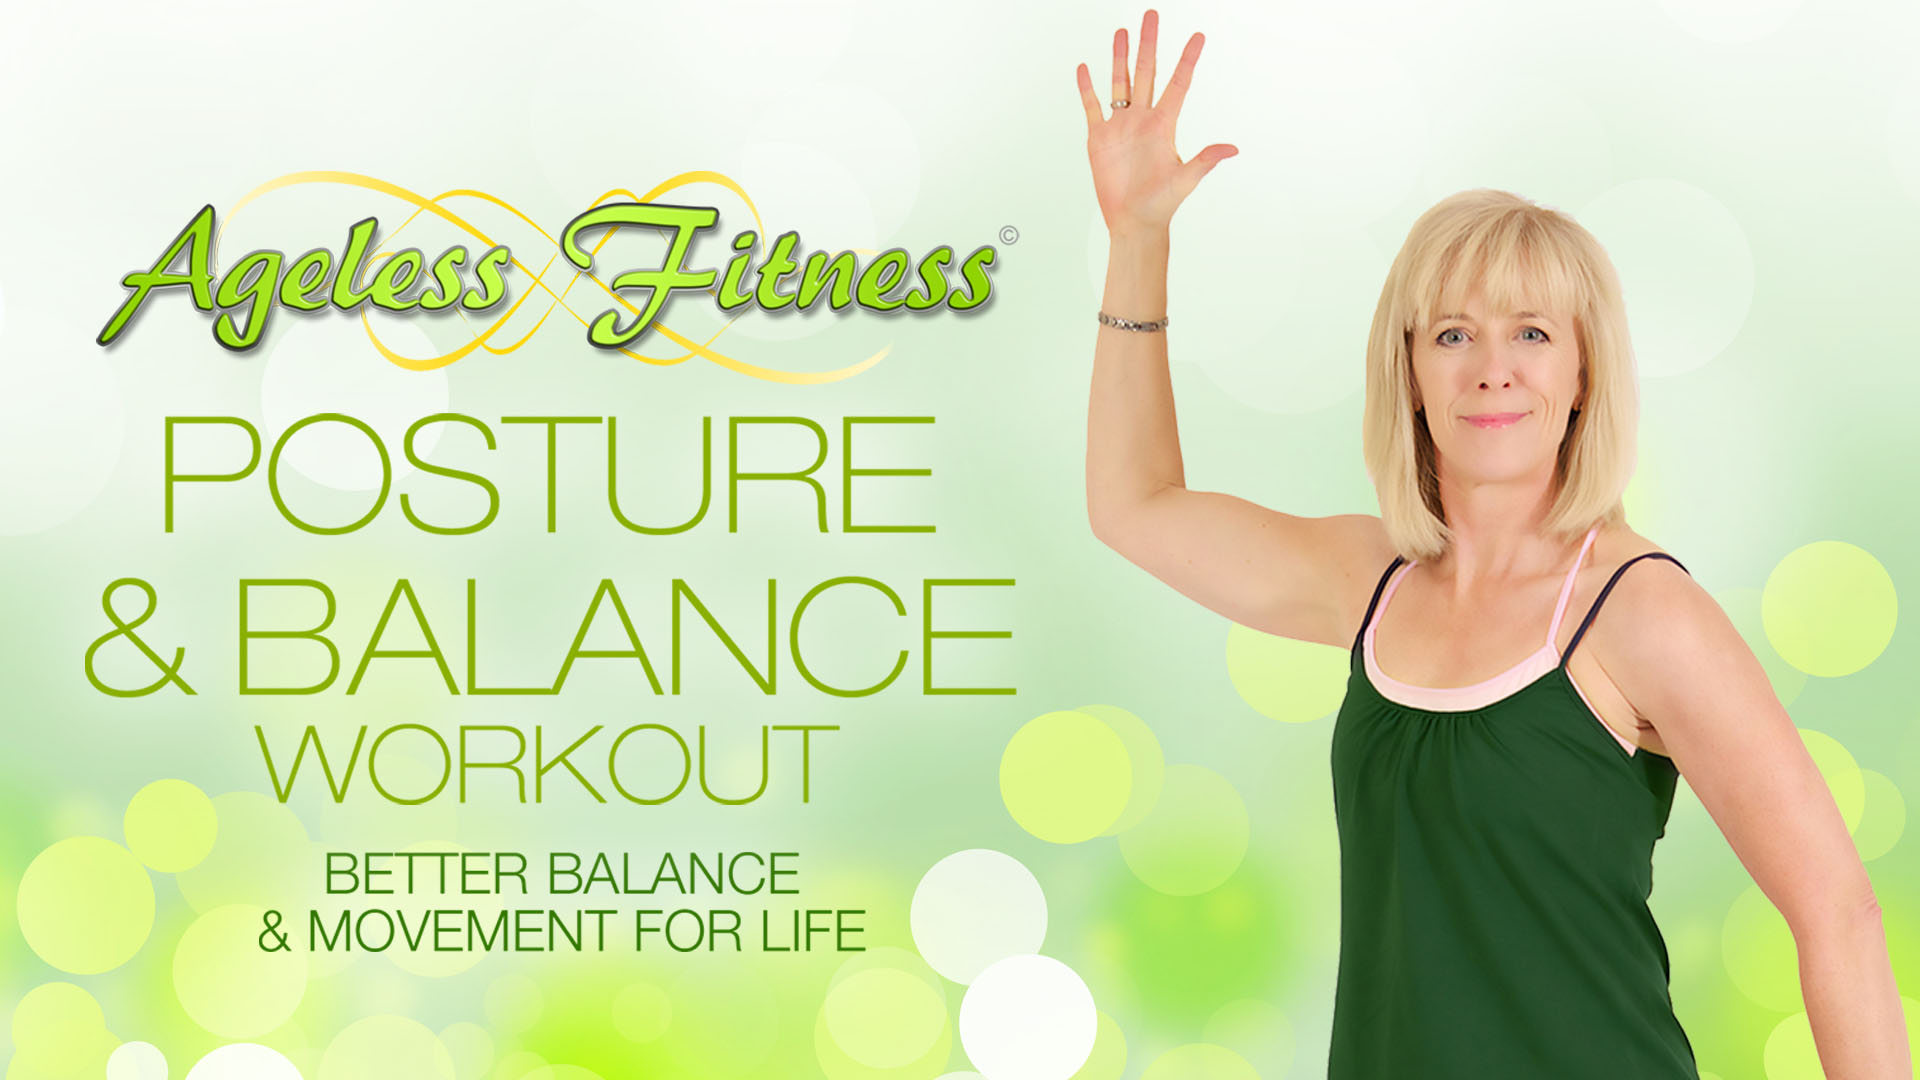 Ageless Fitness - Posture & Balance Workout: Better Balance & Movement for Life